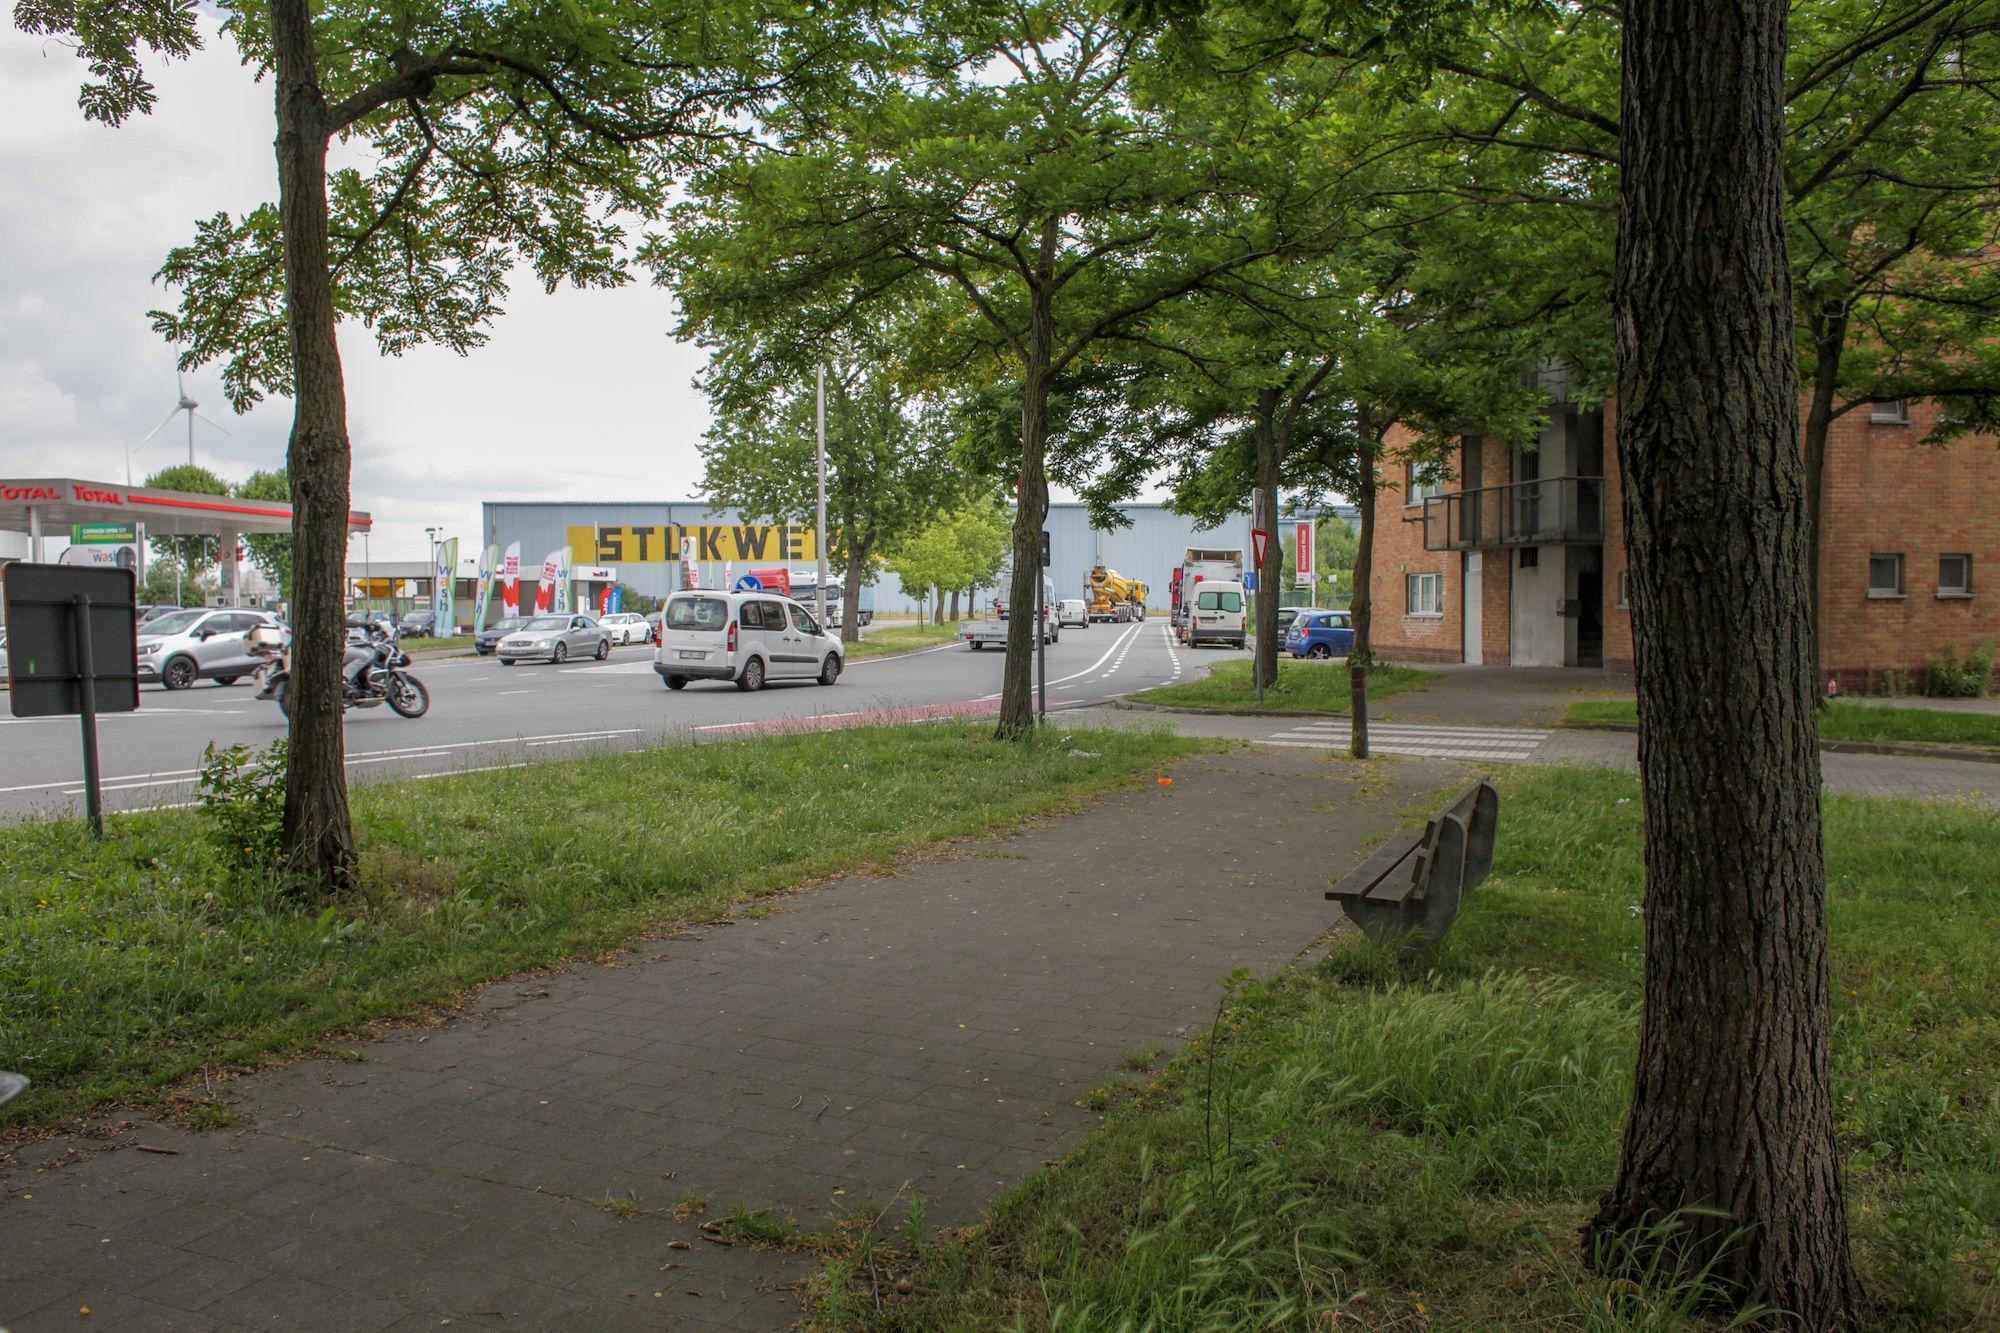 2019-07-02 Muide Meulestede prospectie Wannes_stadsvernieuwing_IMG_0315-2.jpg